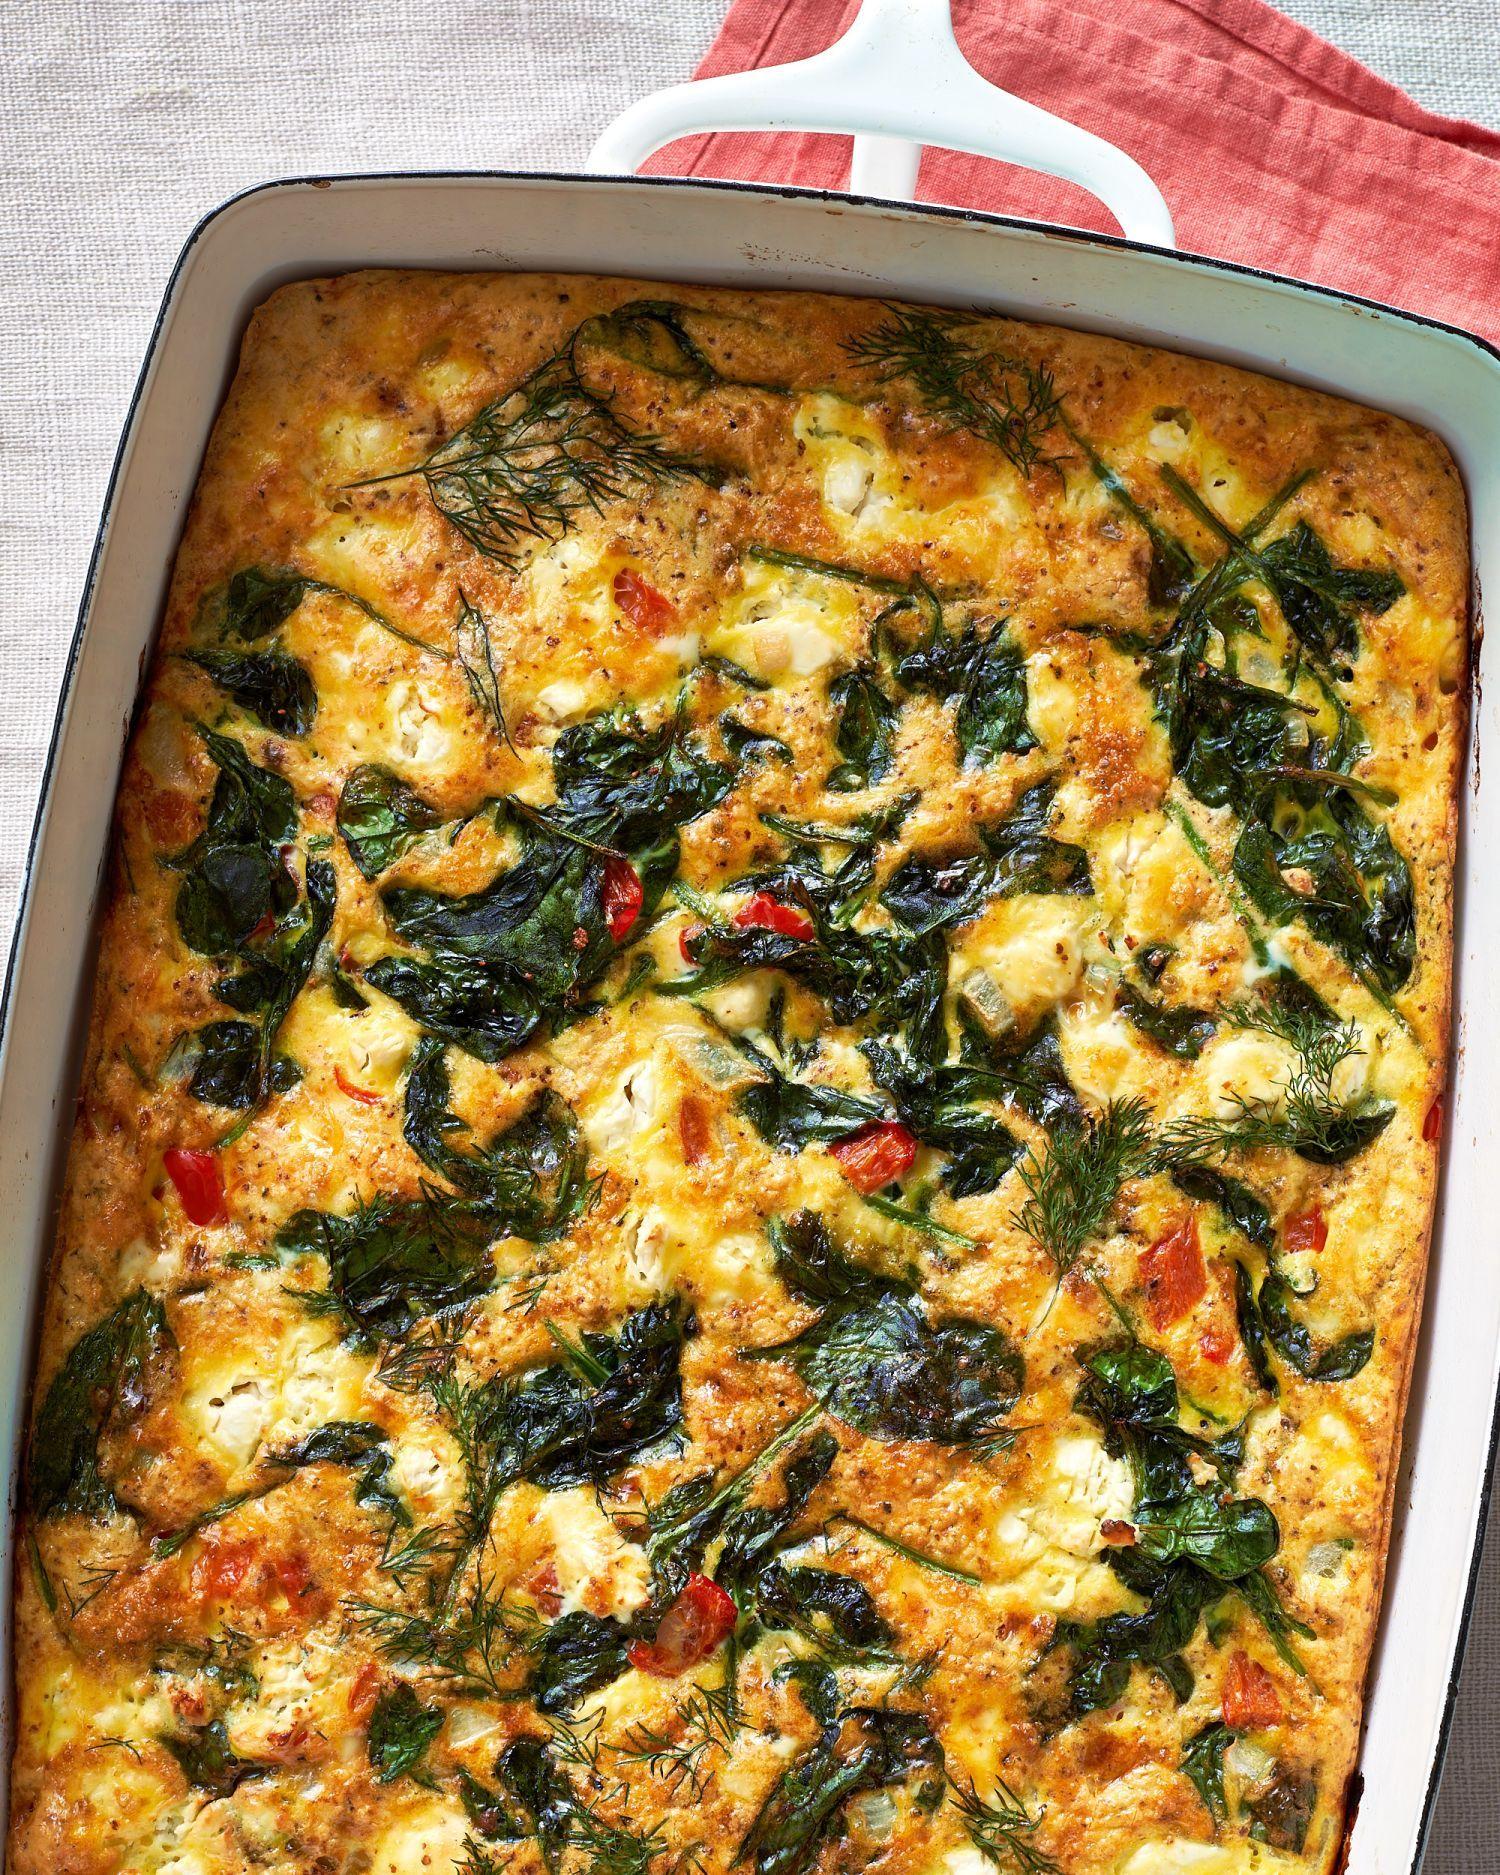 Eggs Florentine Casserole Recipe: Make-Ahead Spinach And Feta Egg Casserole